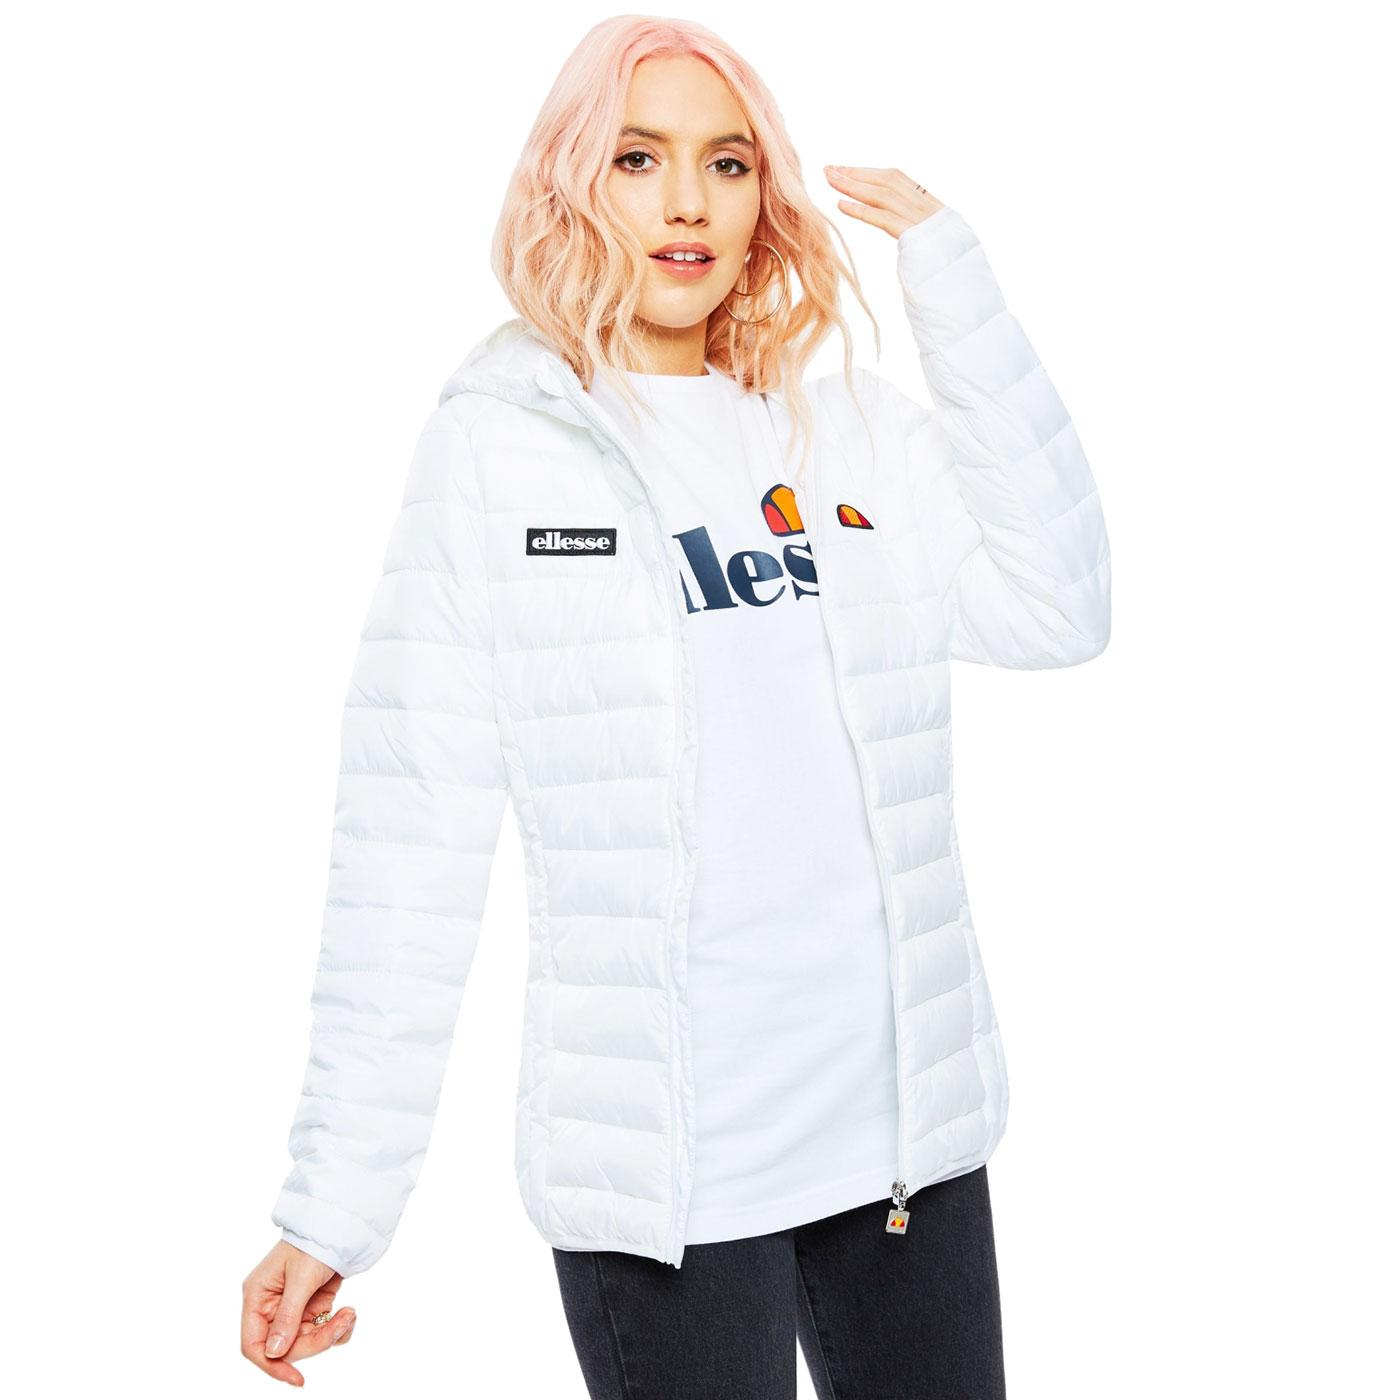 Lompard ELLESSE Women's Padded ski Jacket WHITE